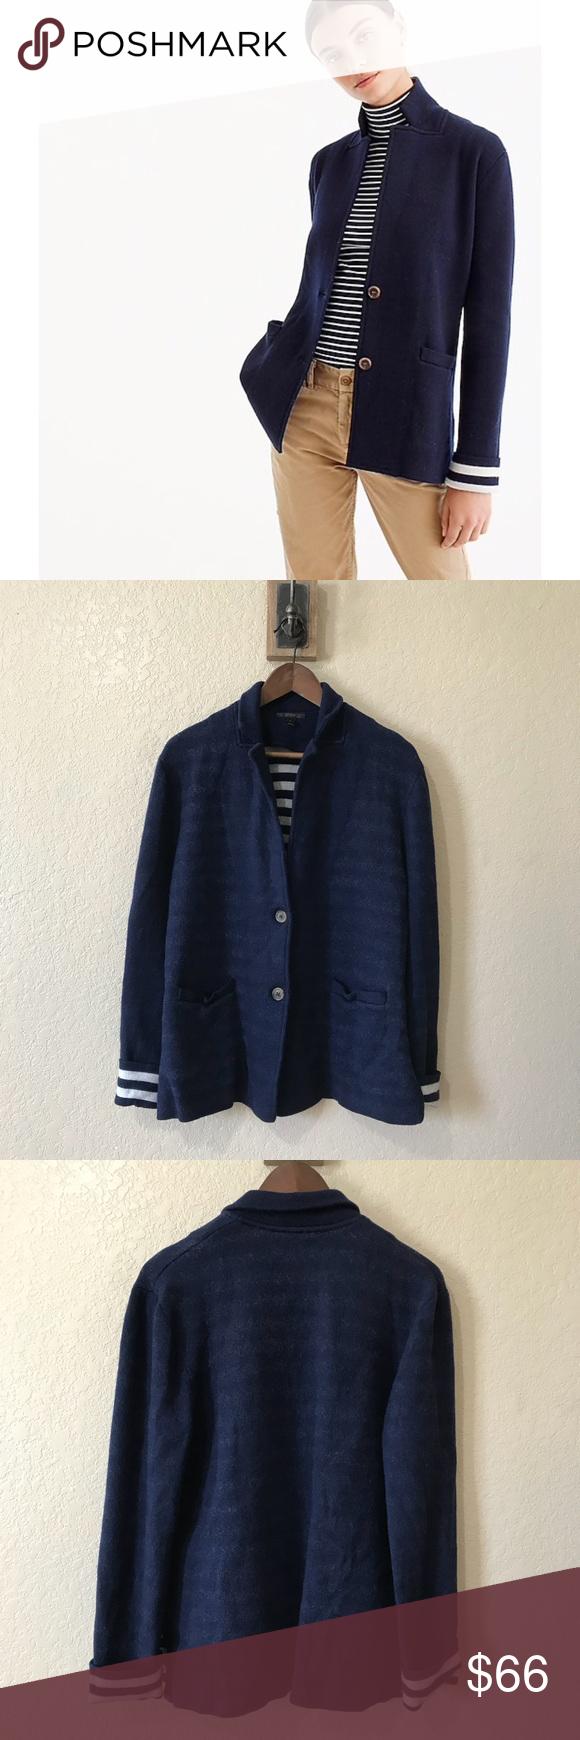 9a96372408210 J. Crew Blue Merino Wool Sweater Blazer The polish of a blazer plus the  coziness